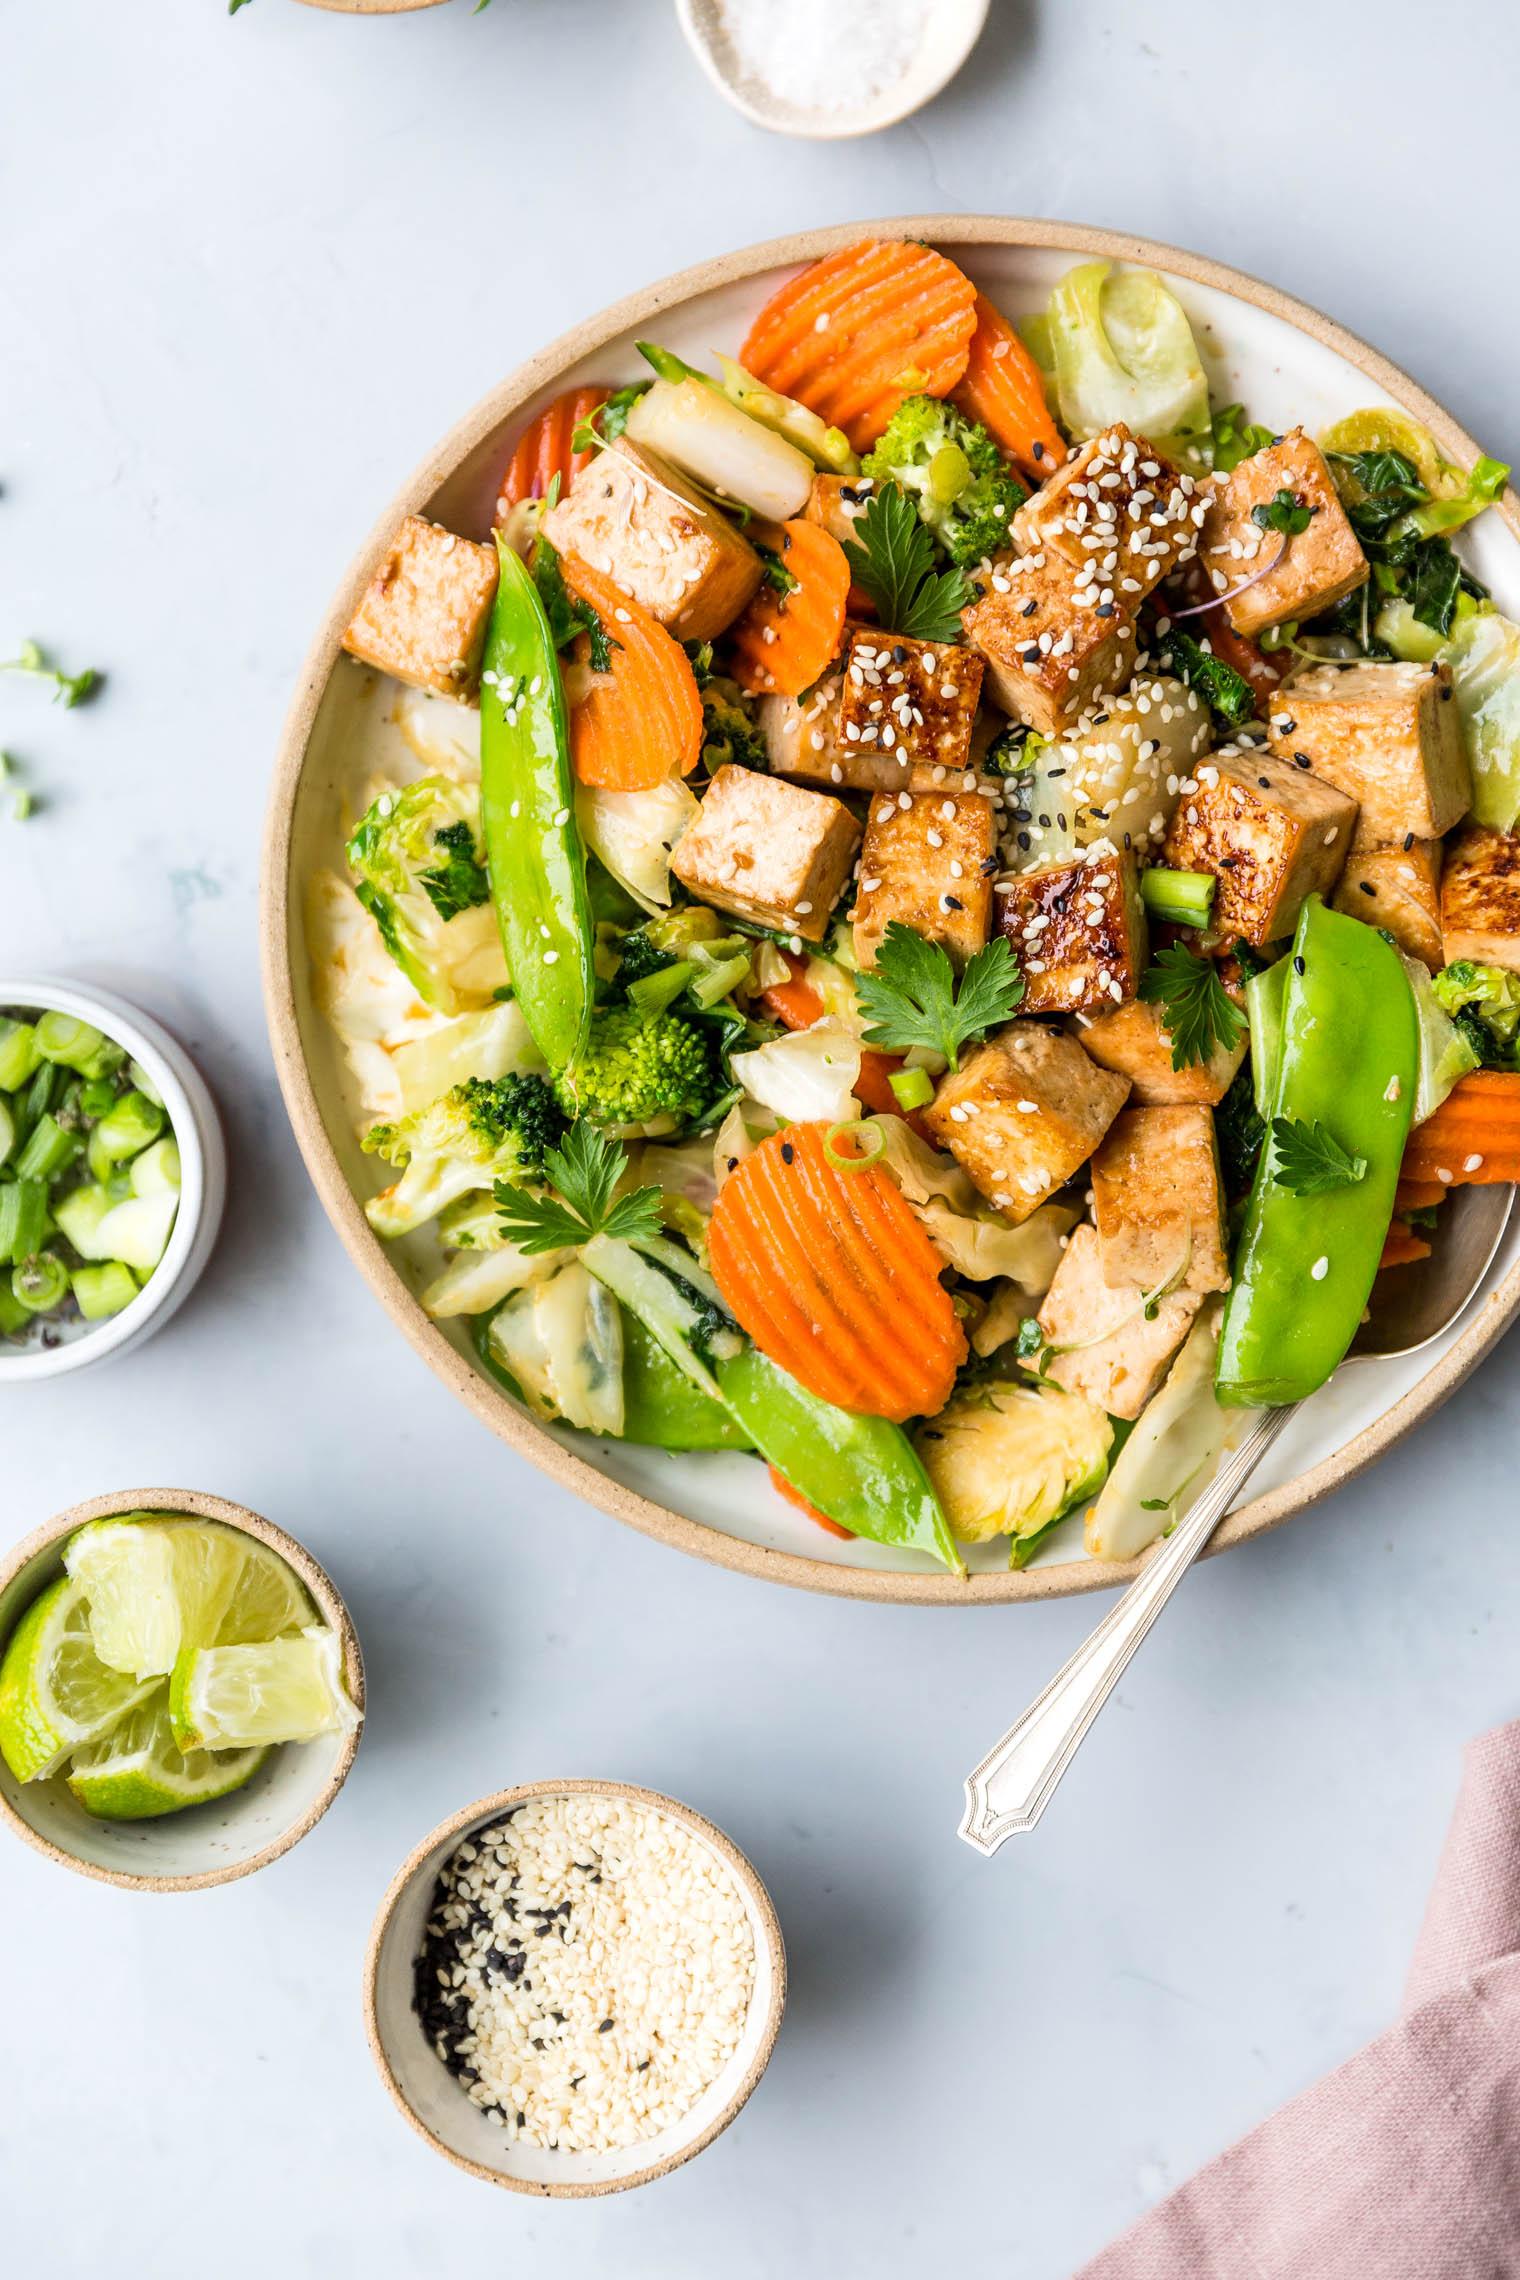 Ginger Sesame Tofu & Winter Vegetable Stir-Fry